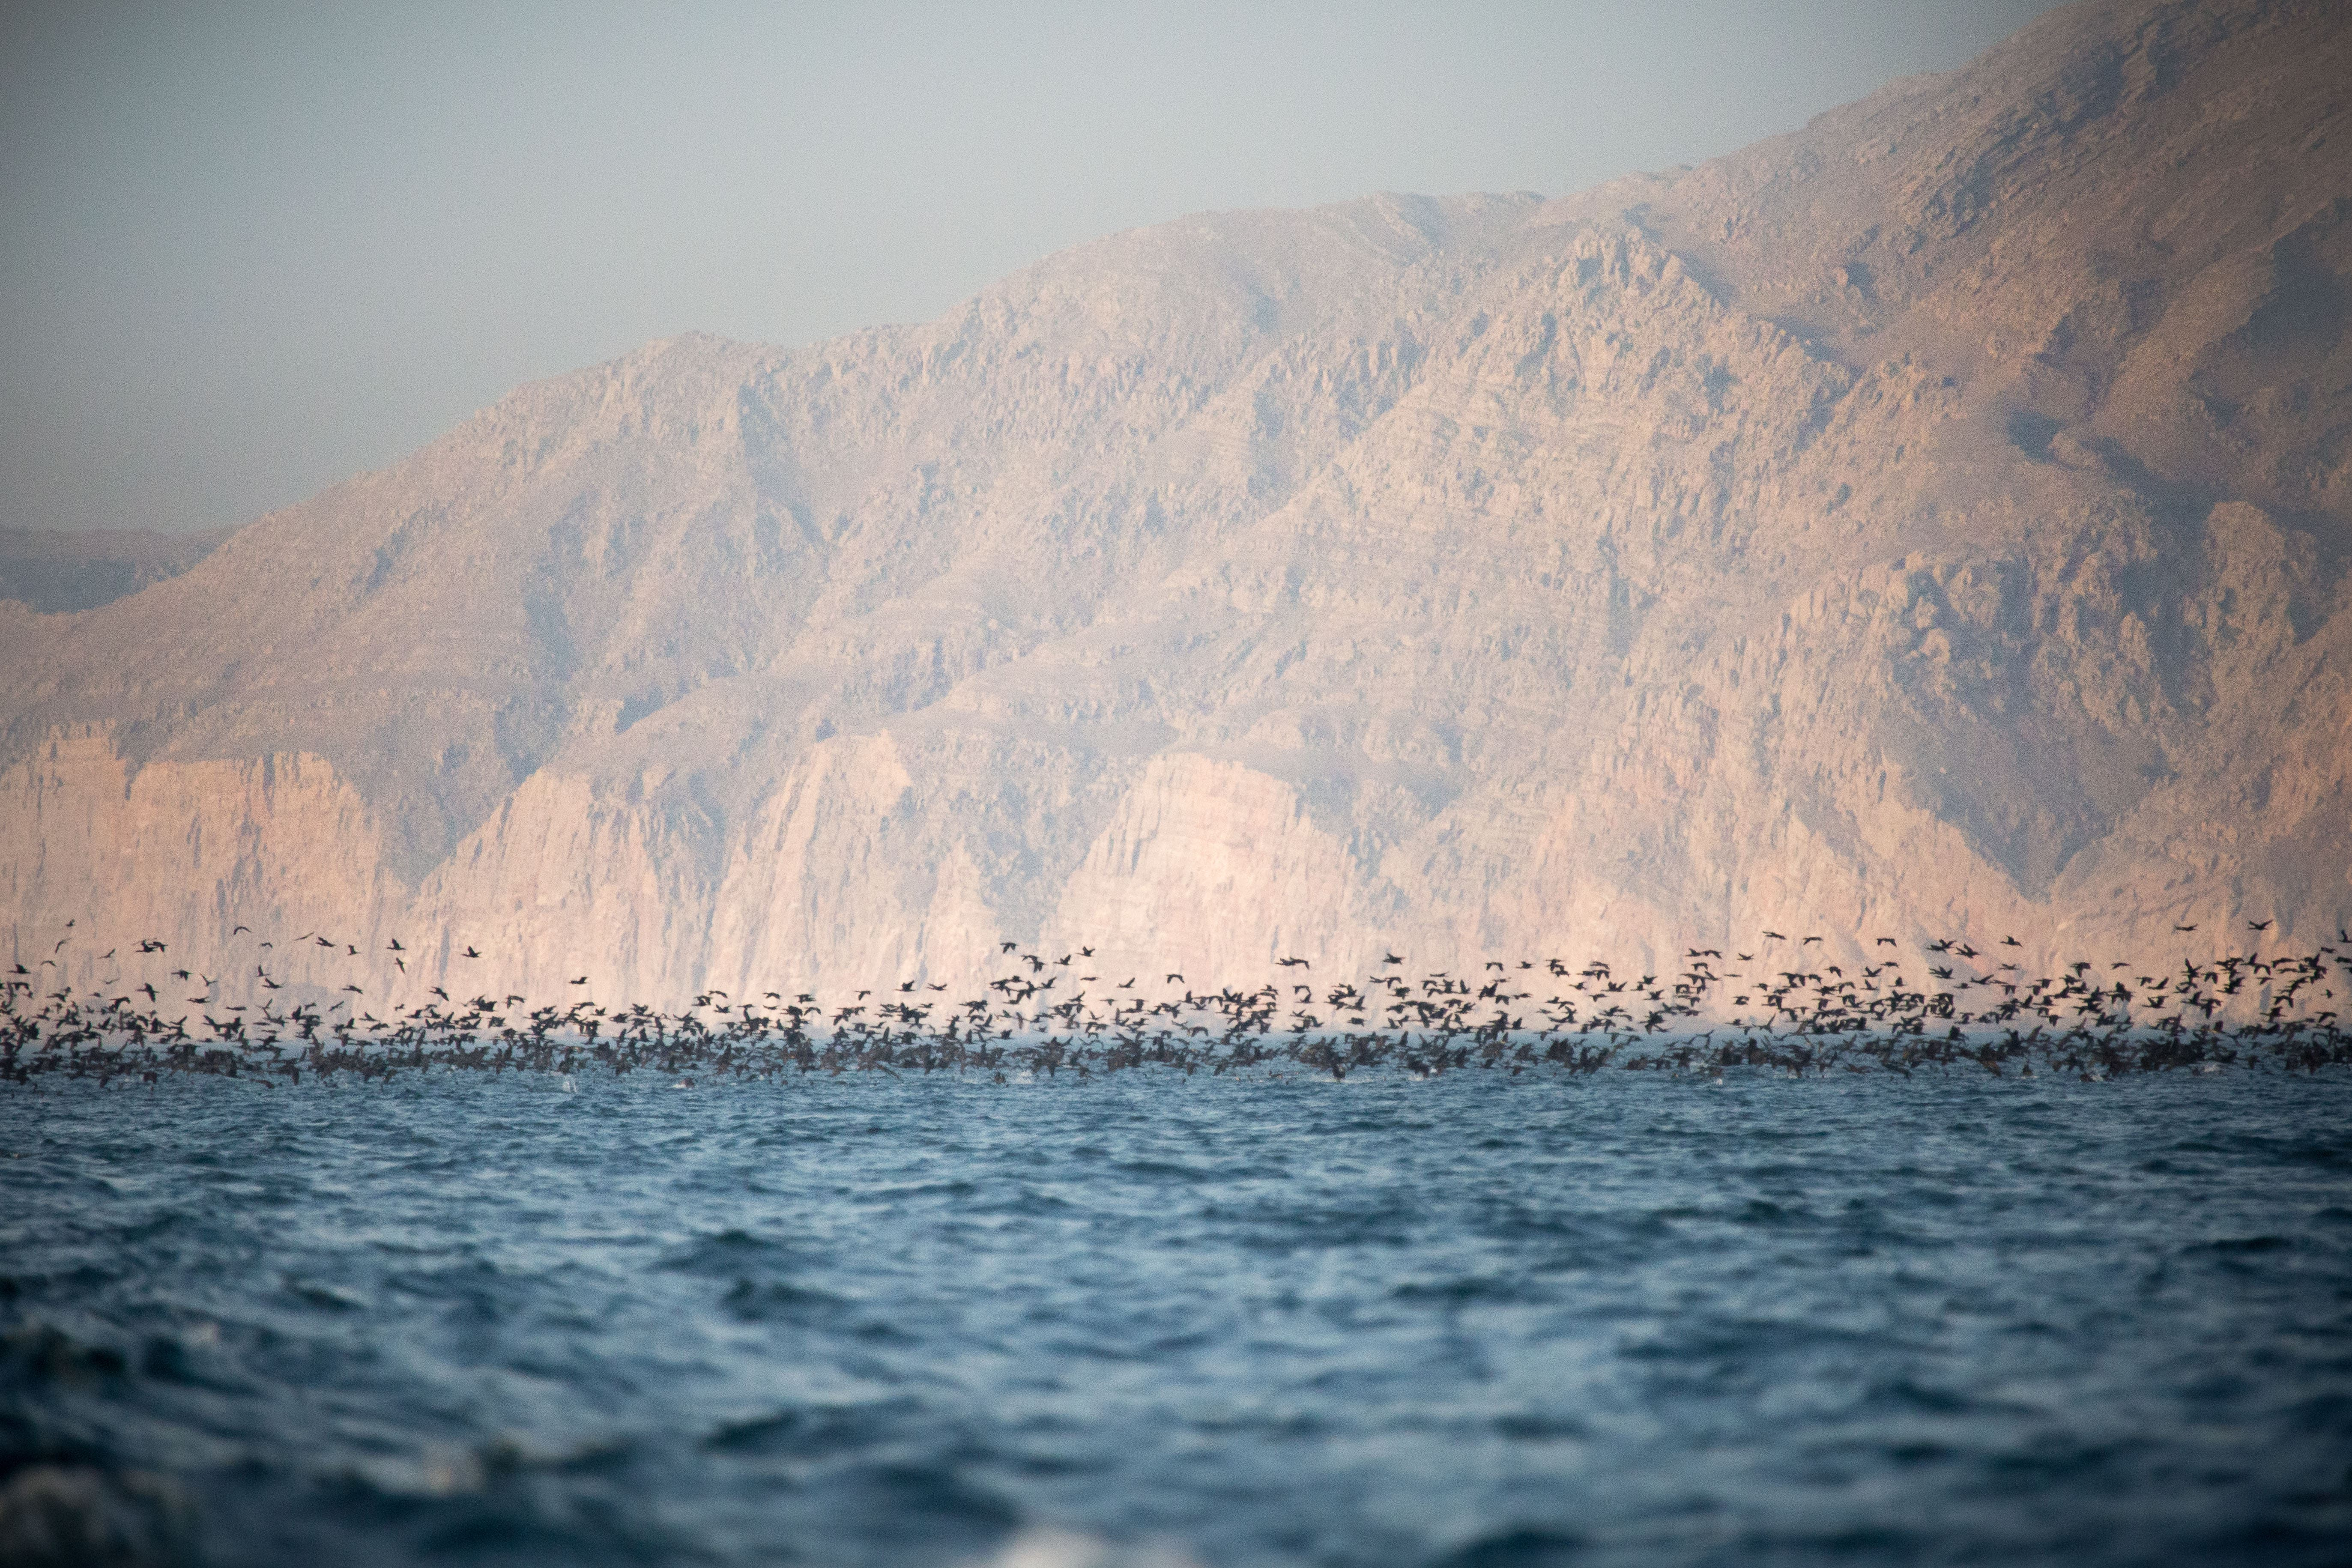 A flock of Socotra cormorants feeding near the Khasab shore. (Amanda Fisher/Al Arabiya News)